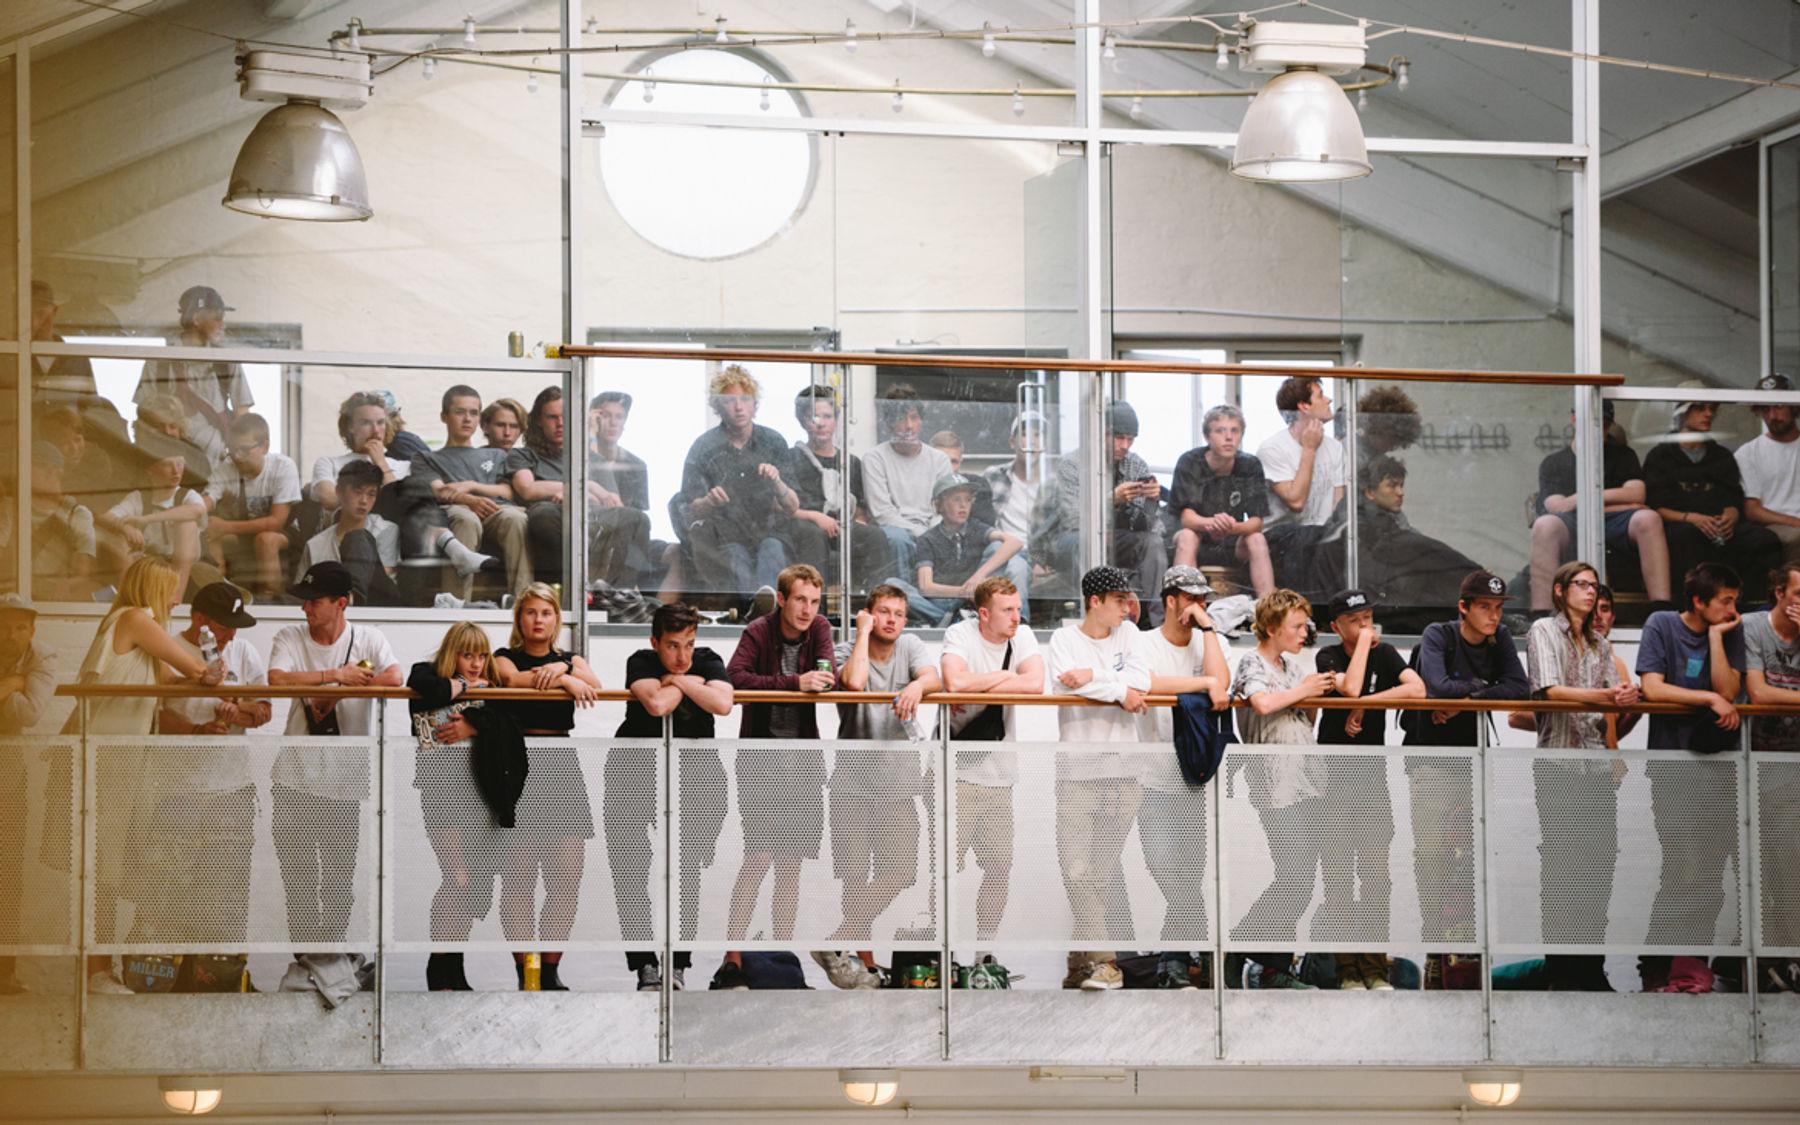 _IHC4744e-Nike-SB-Copenhagen-Open-Day-3-July-2015-Photographer-Maksim-Kalanep